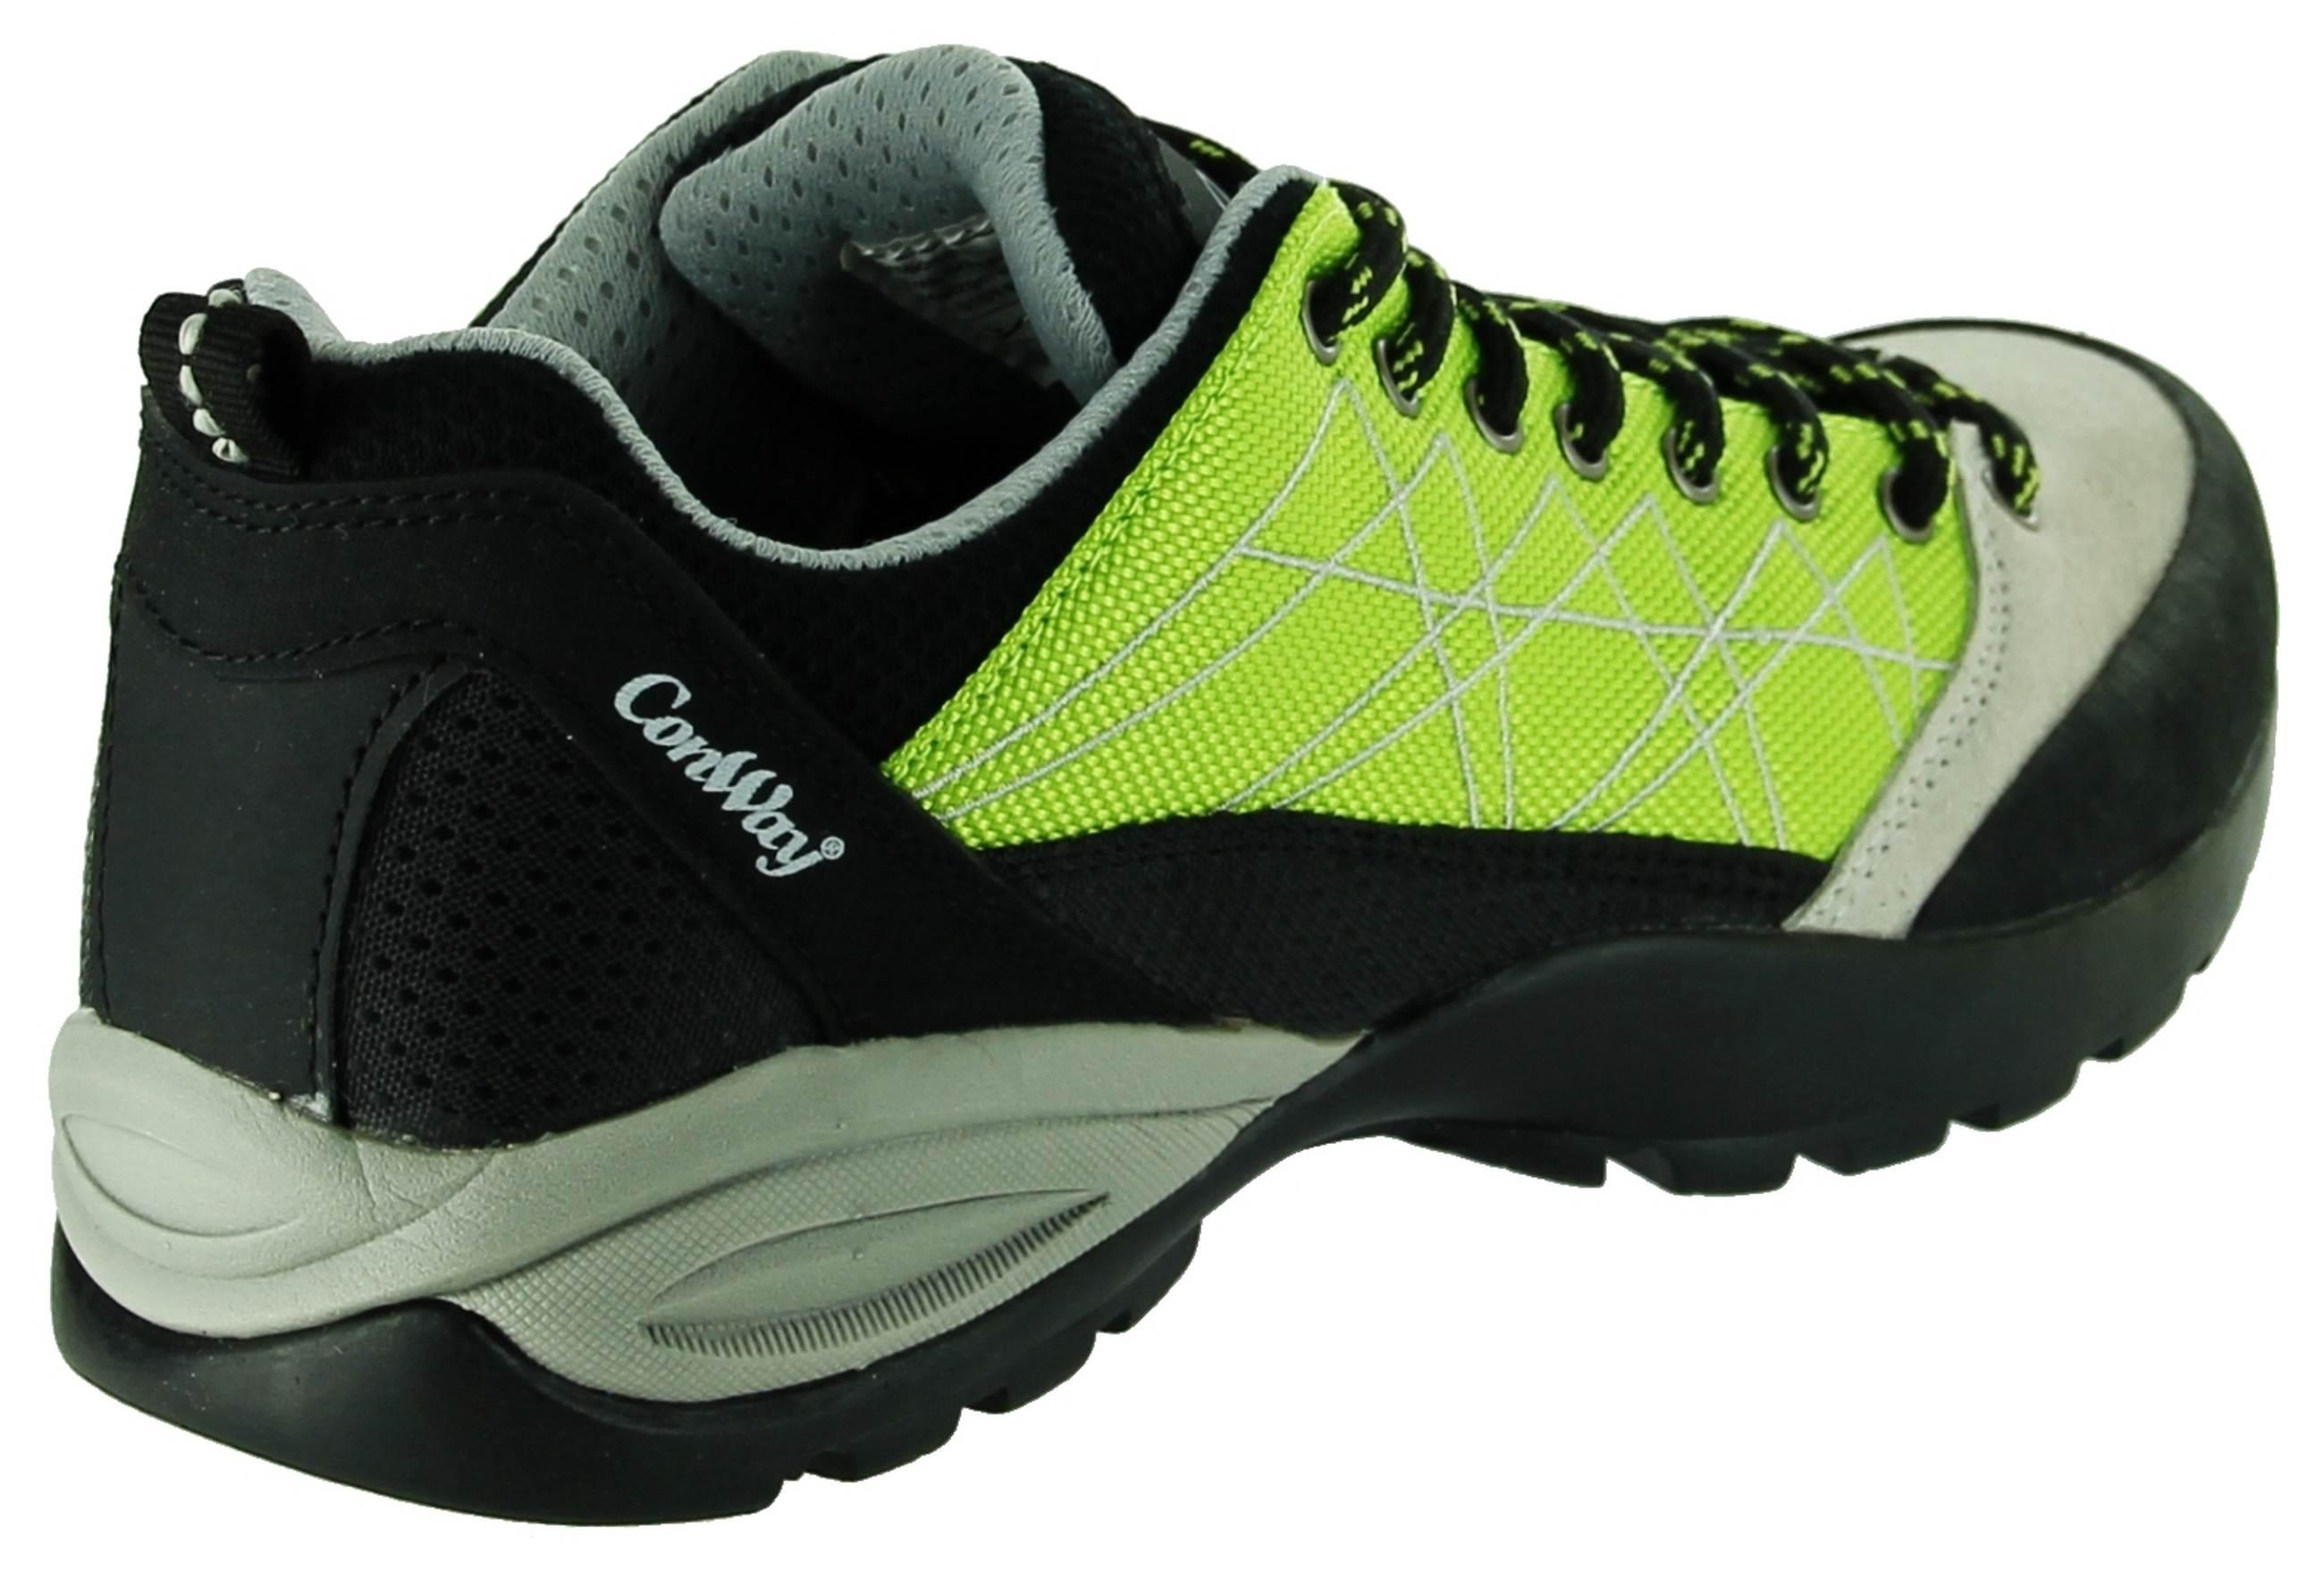 ConWay Sportschuhe Grün Damen Outdoor Wander Trekking Schuhe Condor, Farbe:Grün, Größe:41